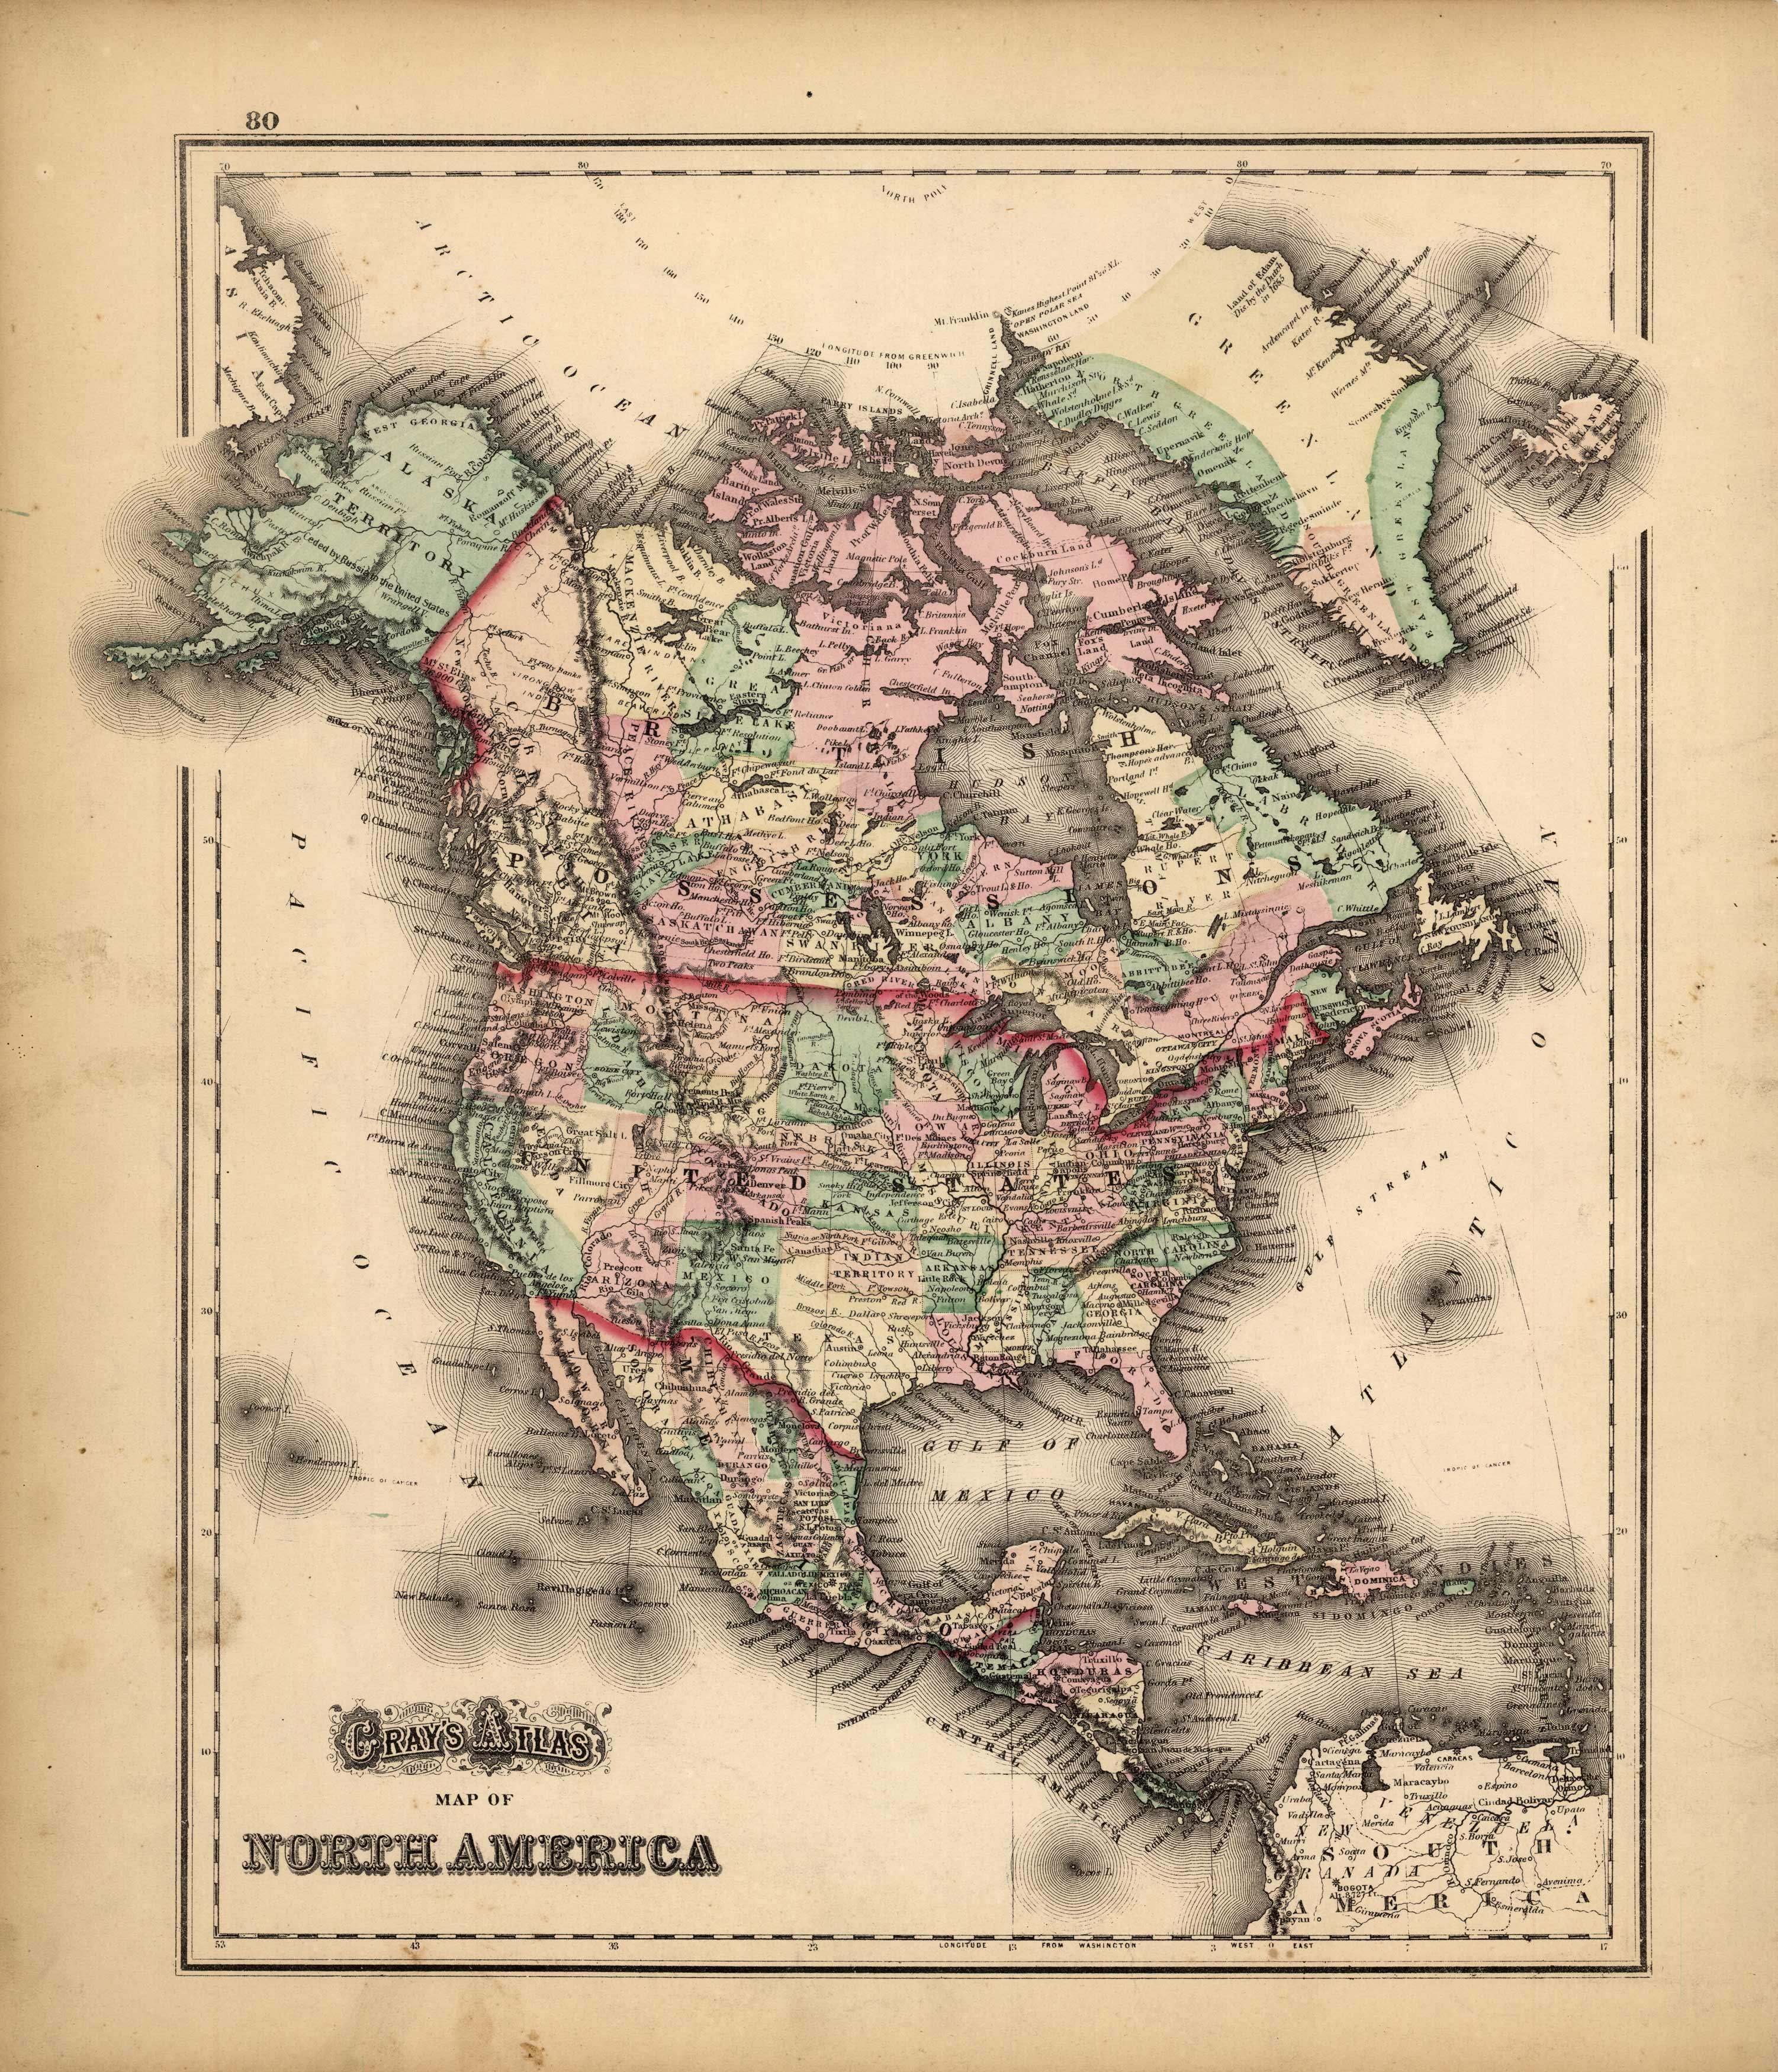 Grays Atlas Map of North America'